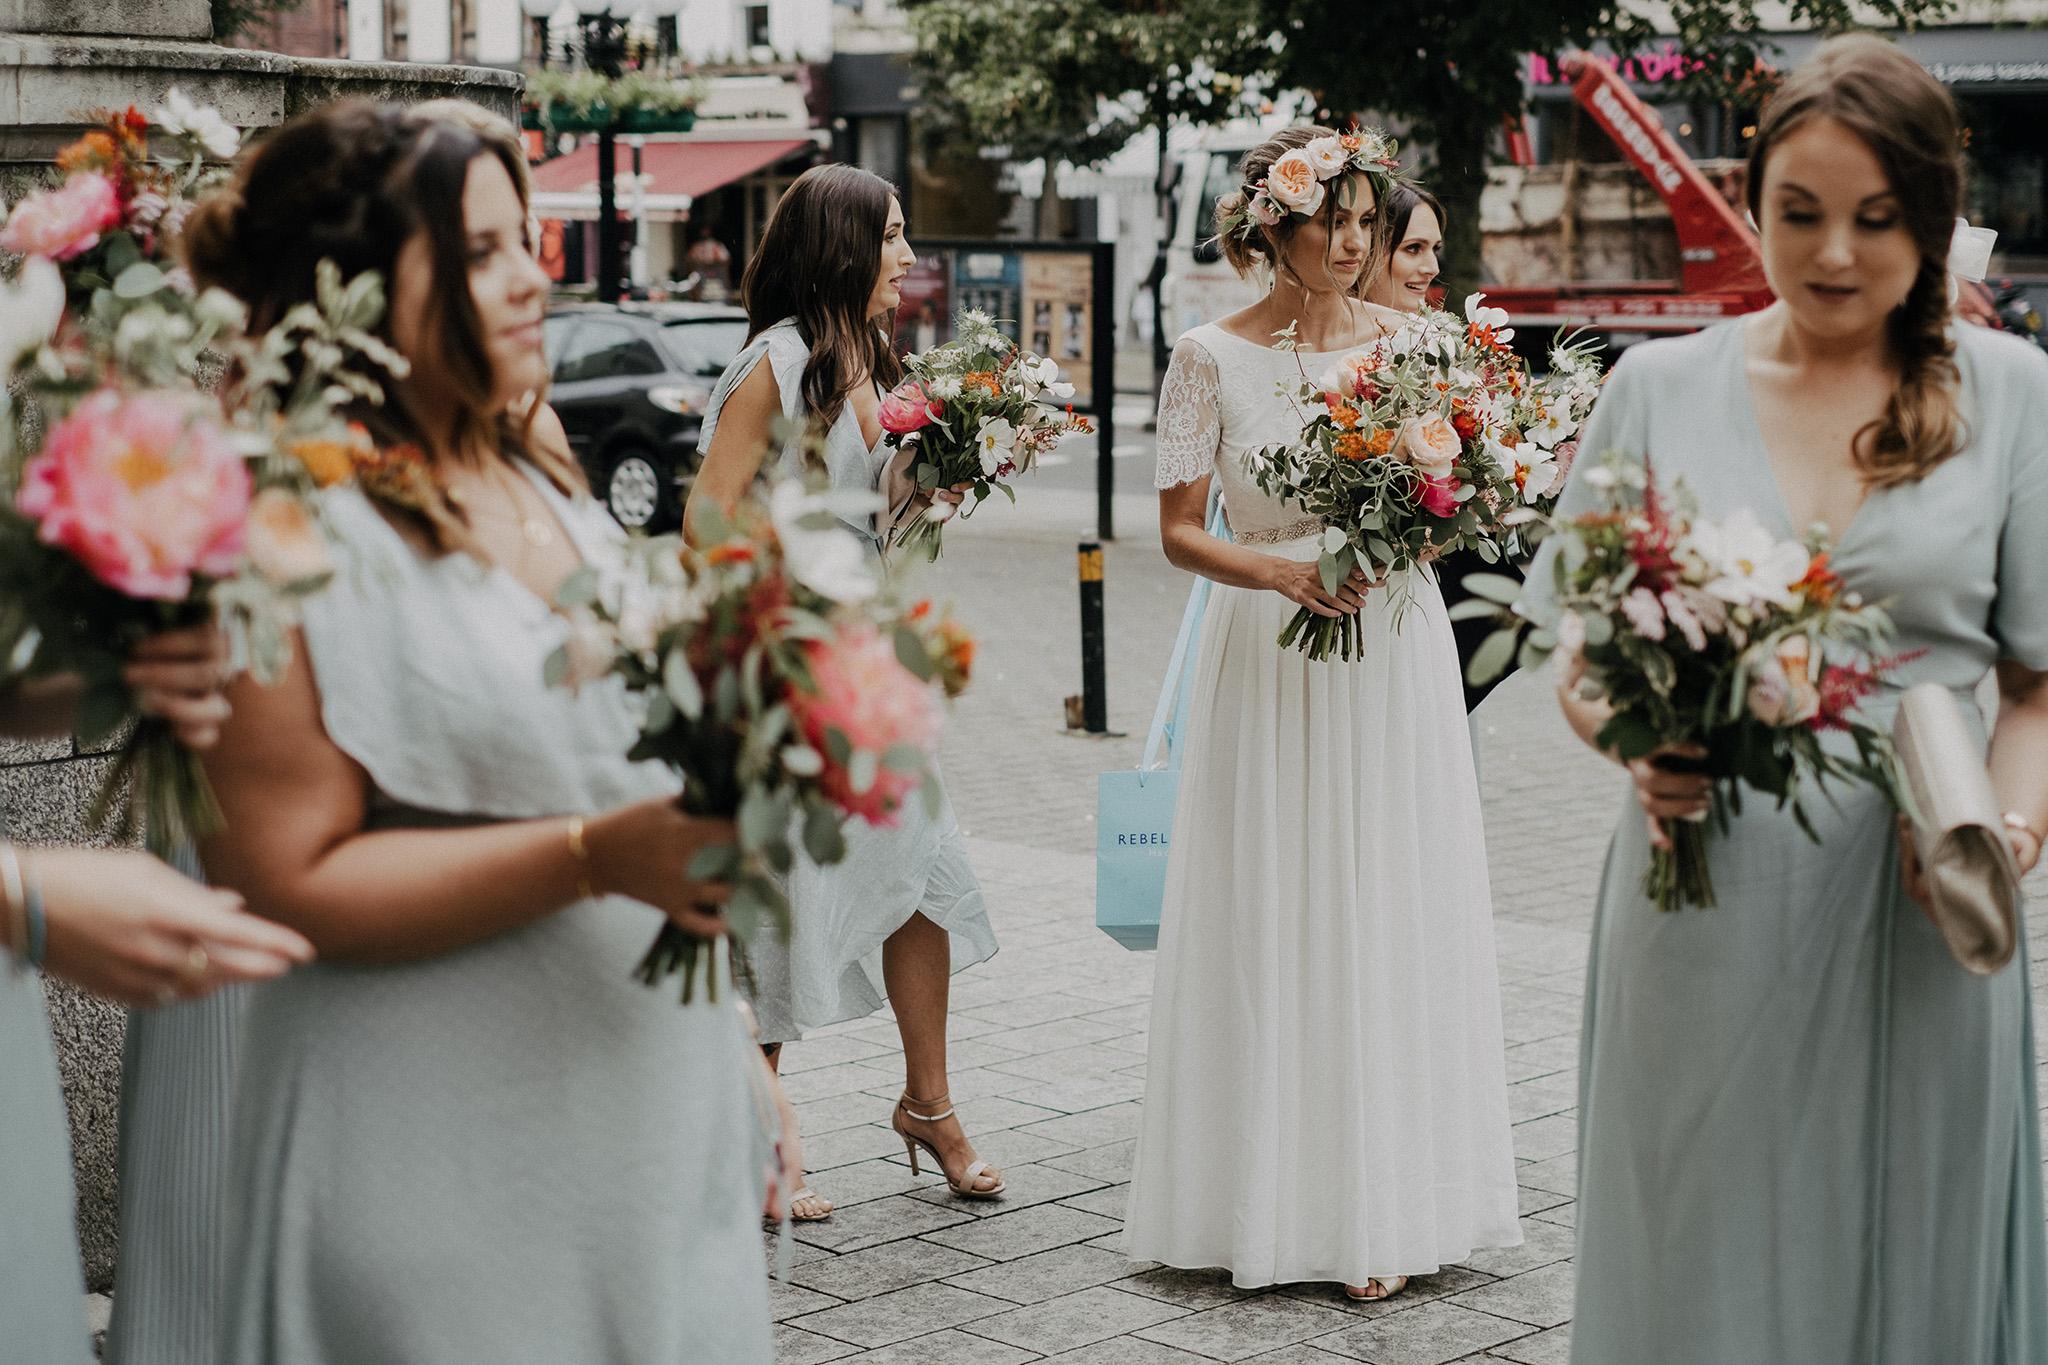 Islington-town-hall-wedding119.jpg